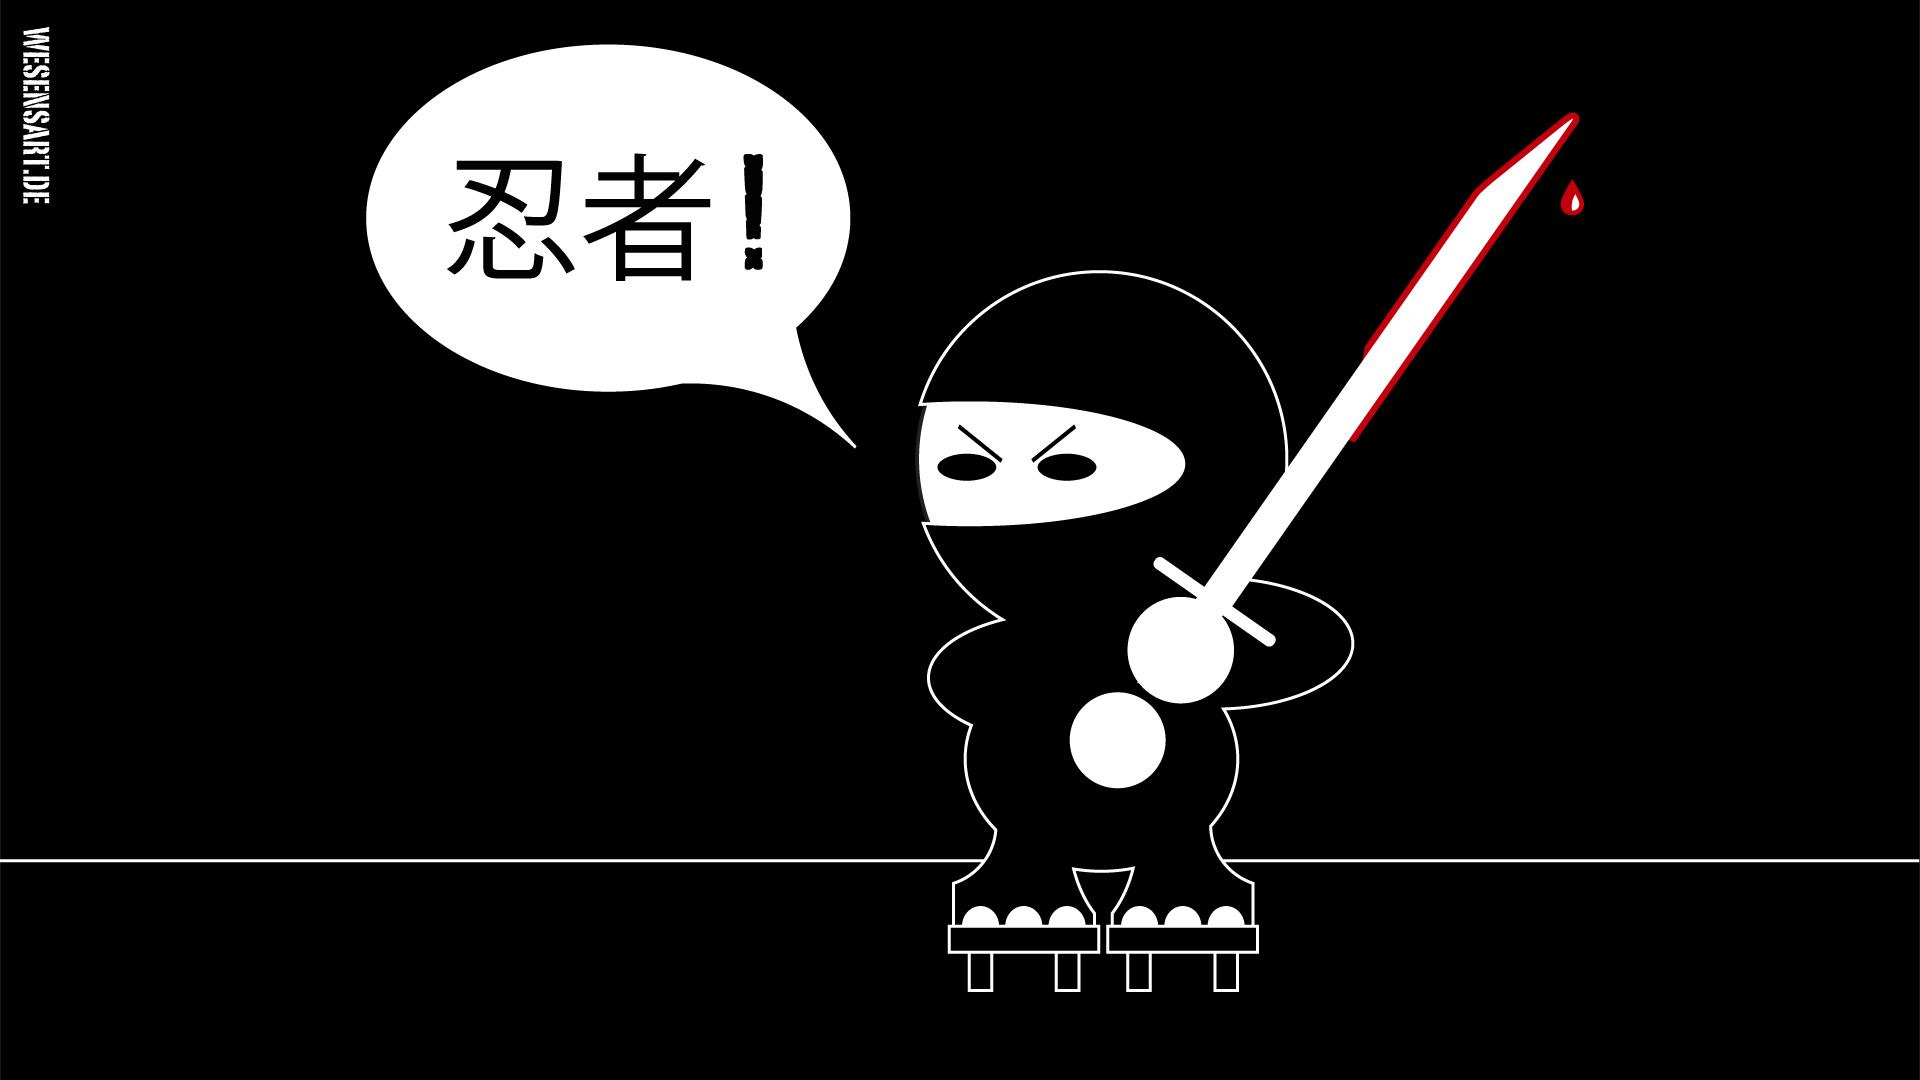 Ninjas sind cool!